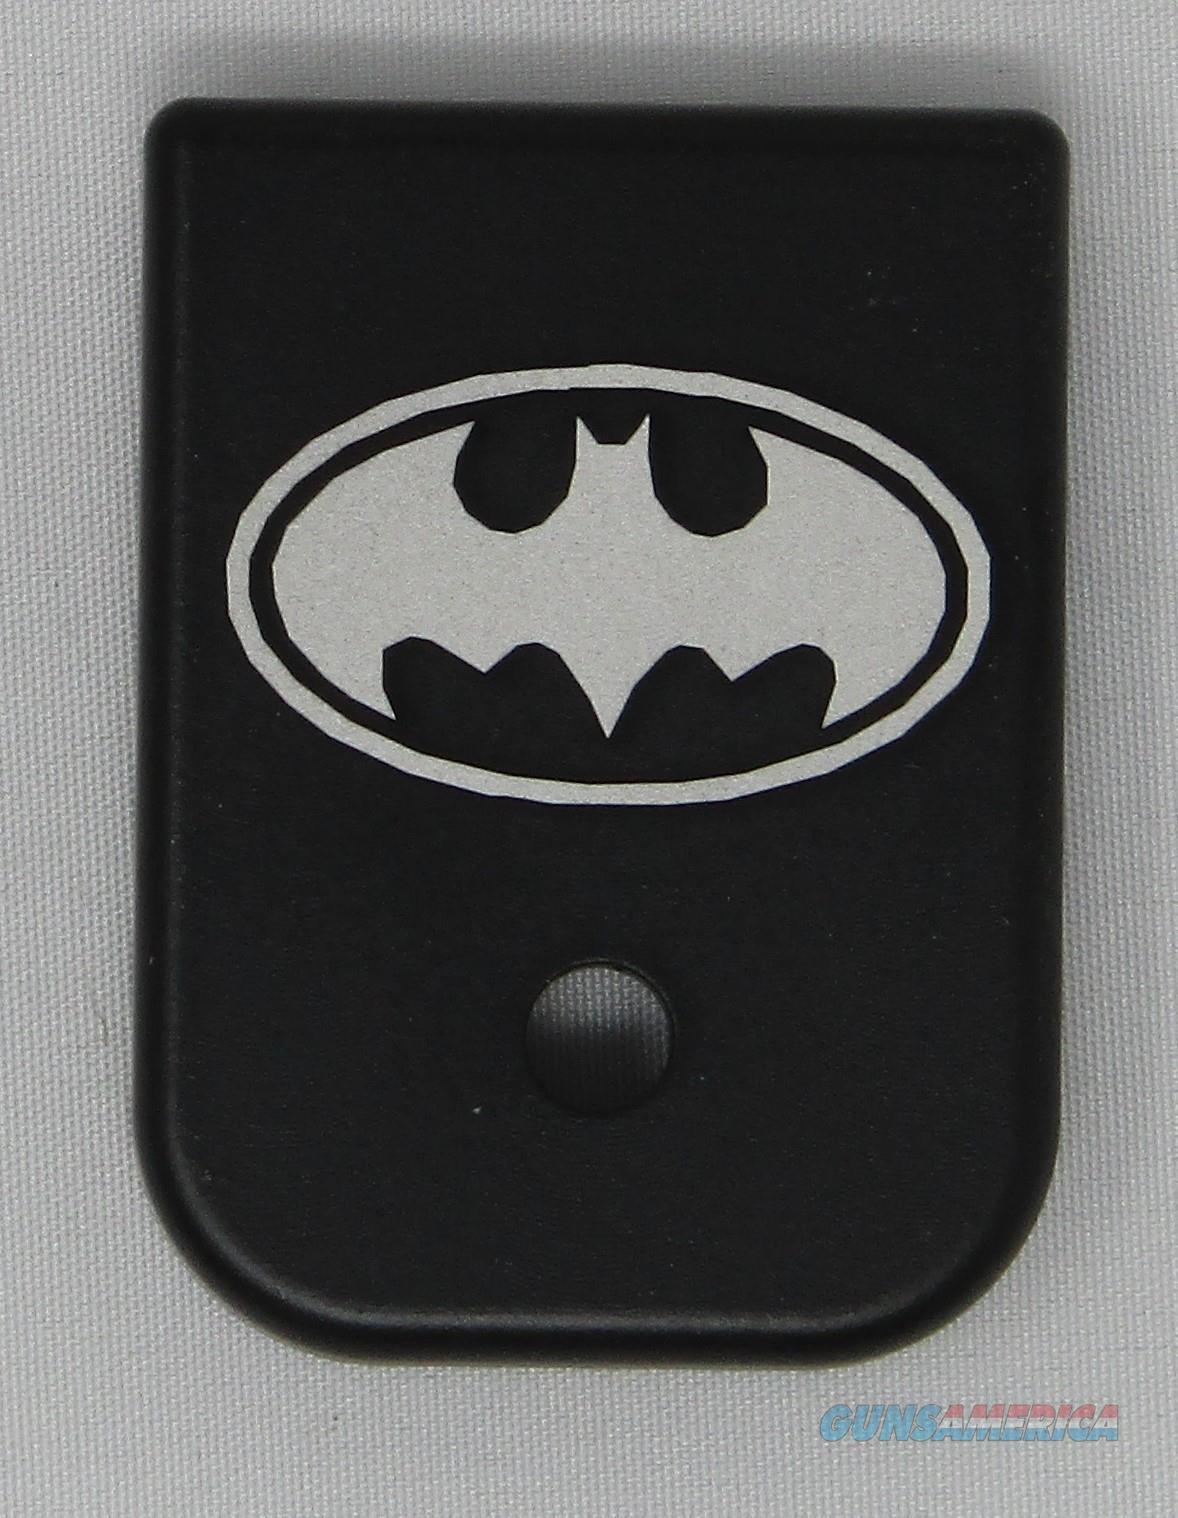 Laser Engraved Glock Mag Base Plate Batman  Non-Guns > Gun Parts > Misc > Pistols